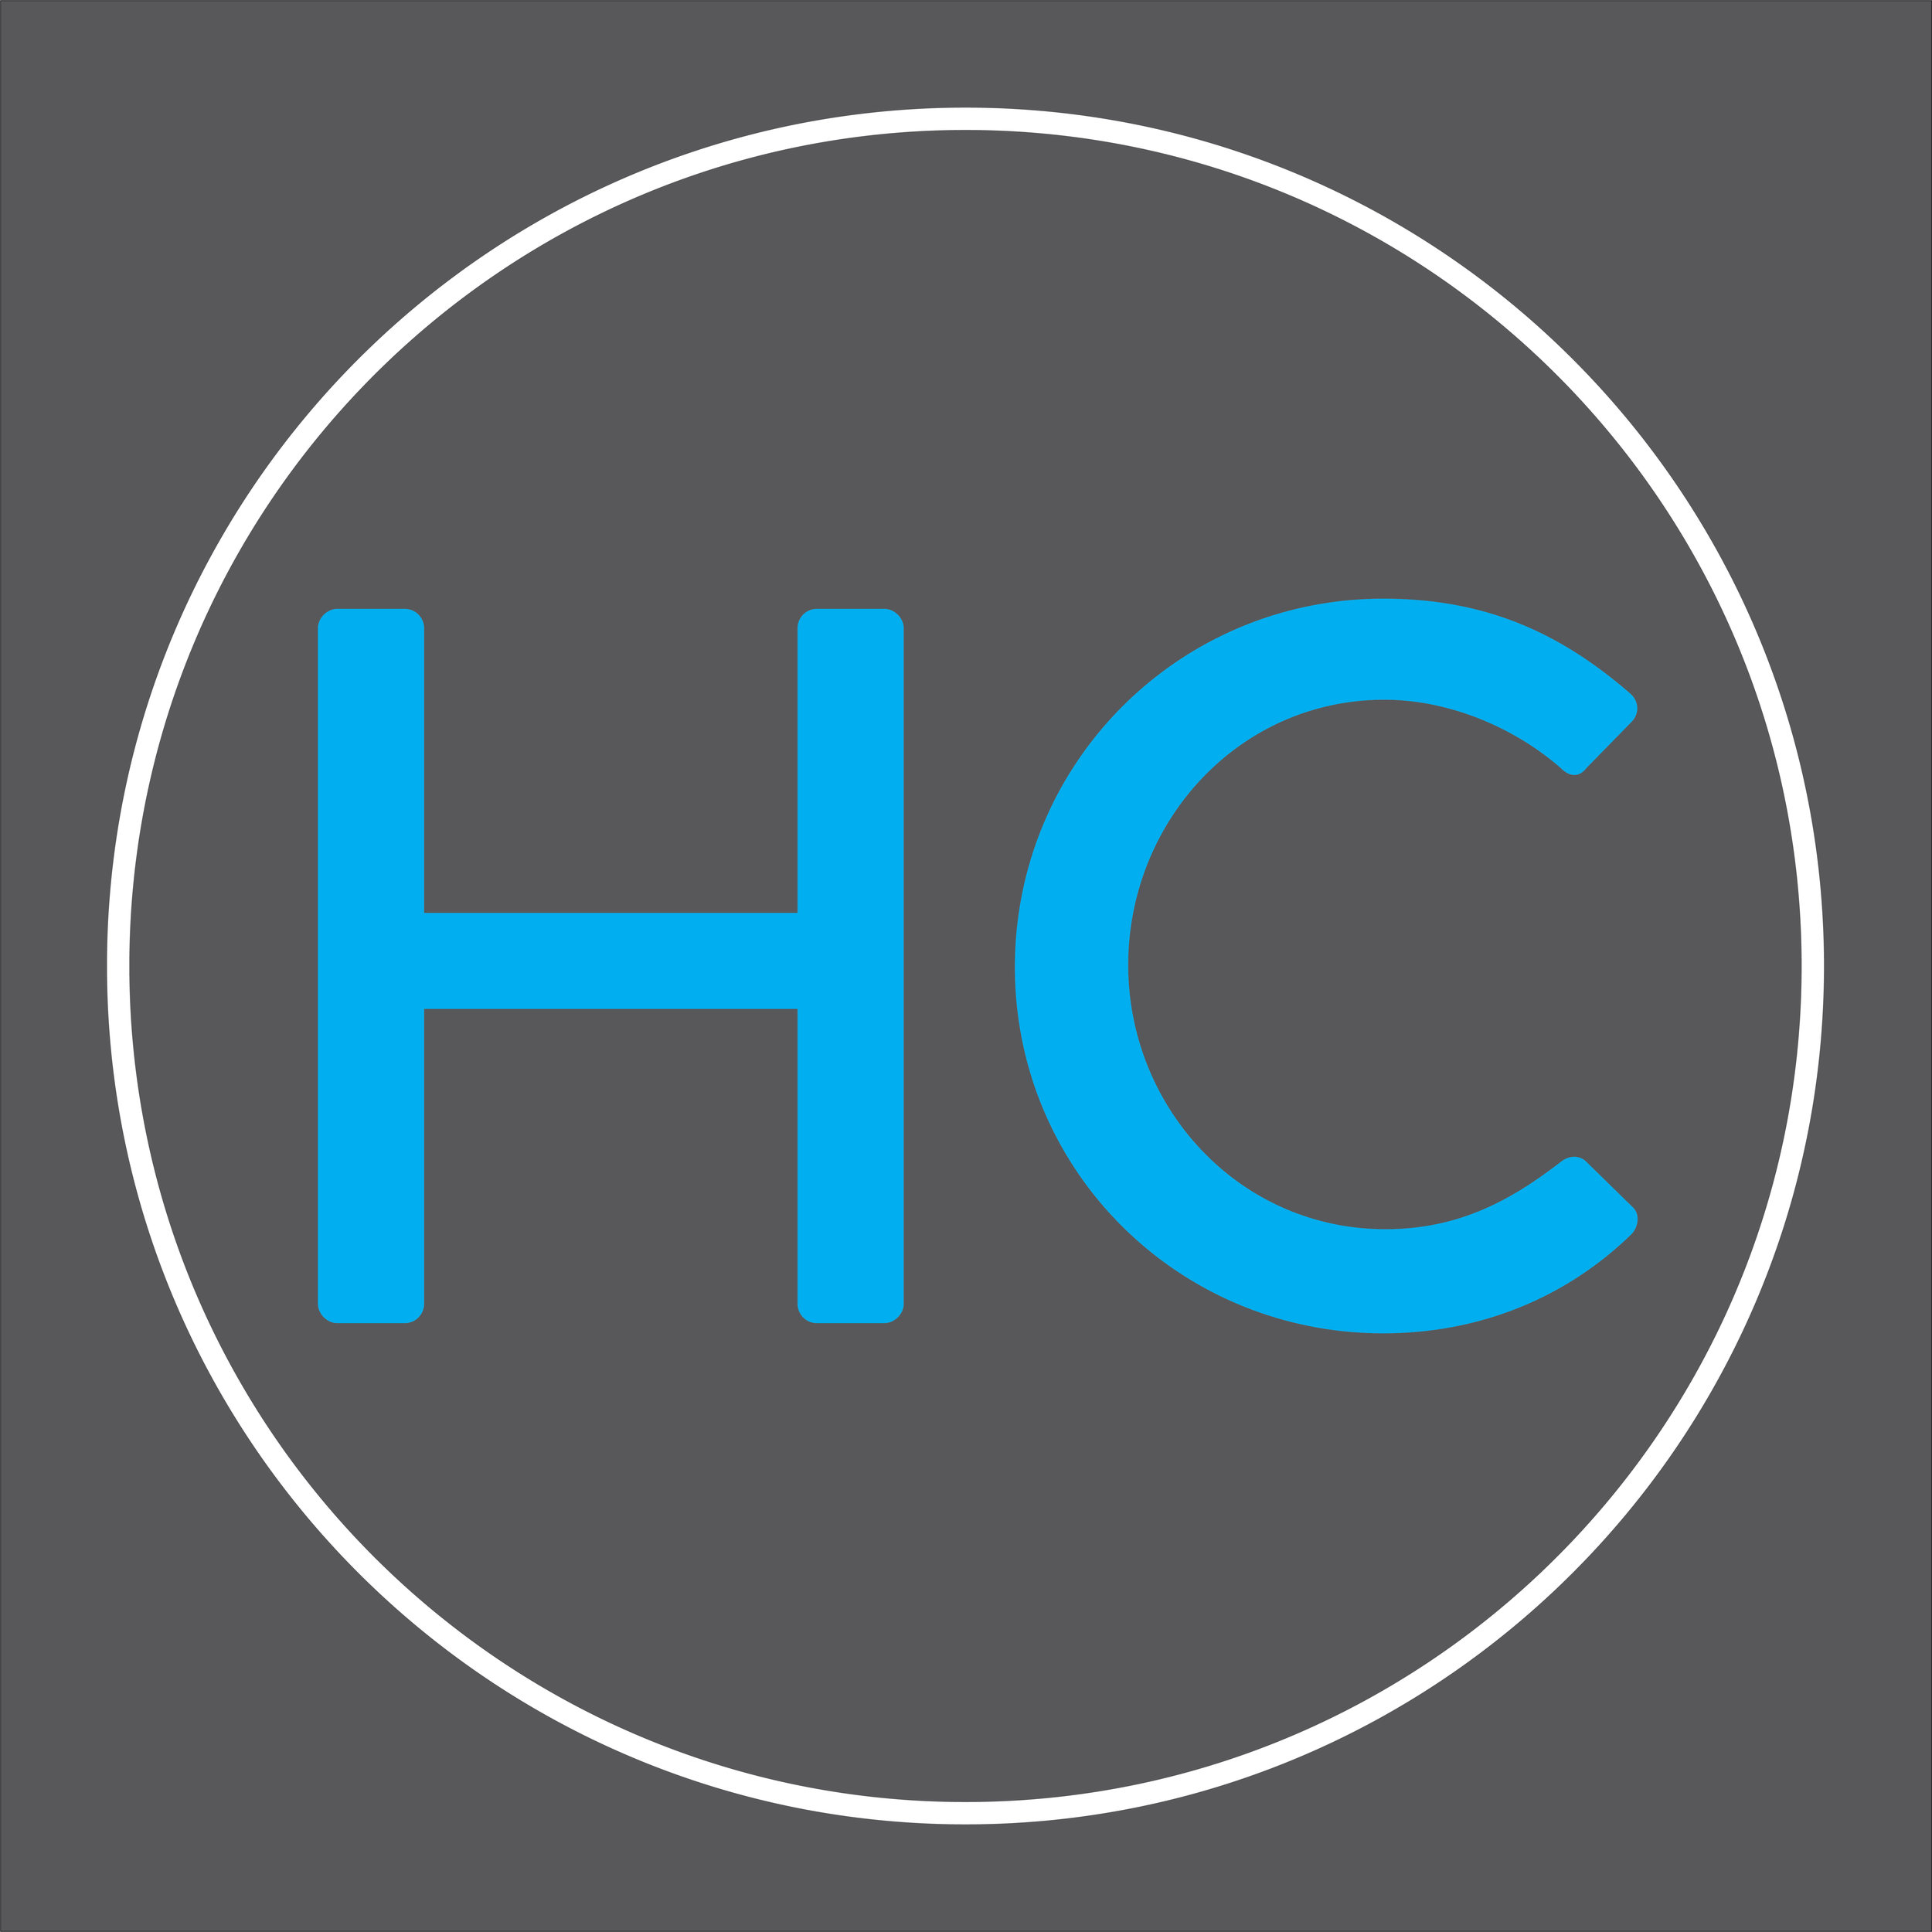 Hope_logo_charcoal.png